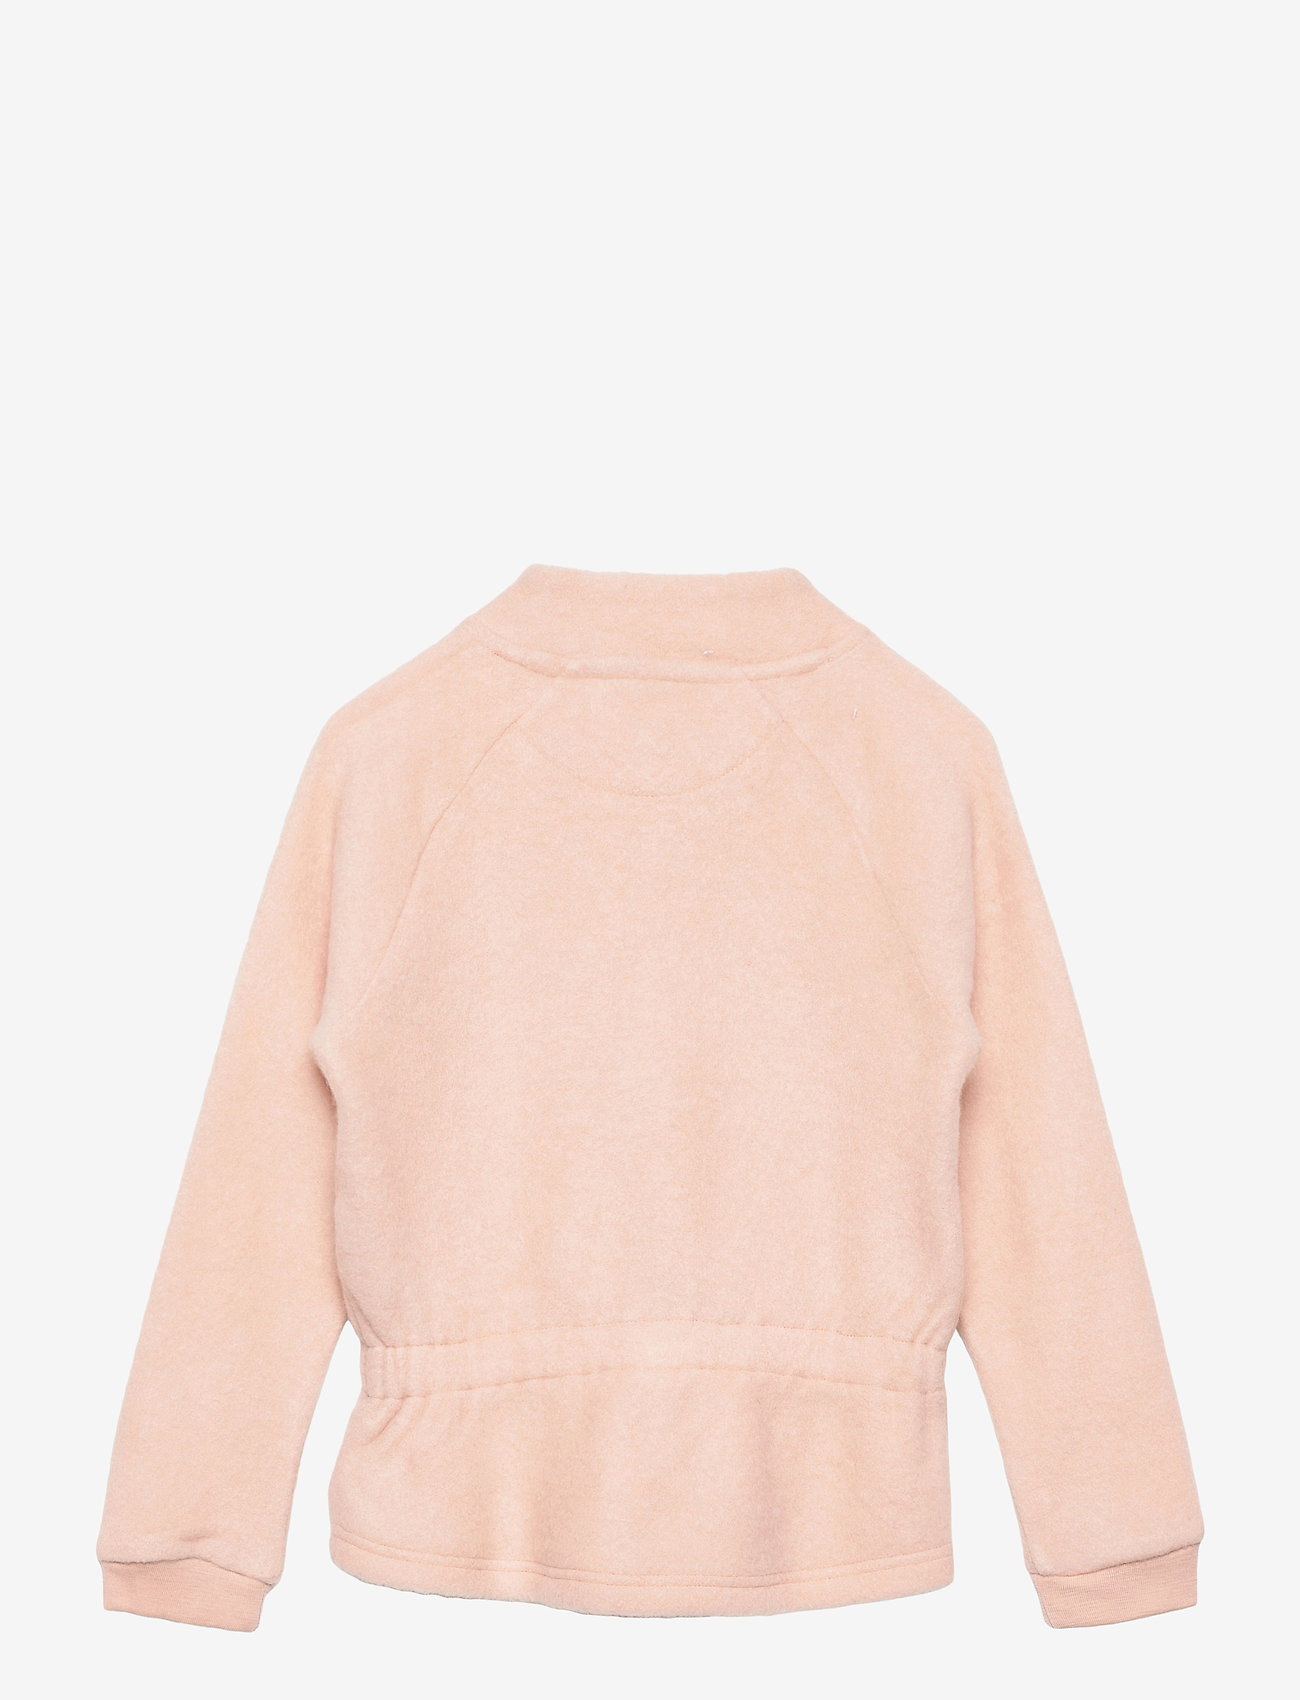 Mini A Ture - Lola Jacket, MK - fleecejakke - rose dust - 1